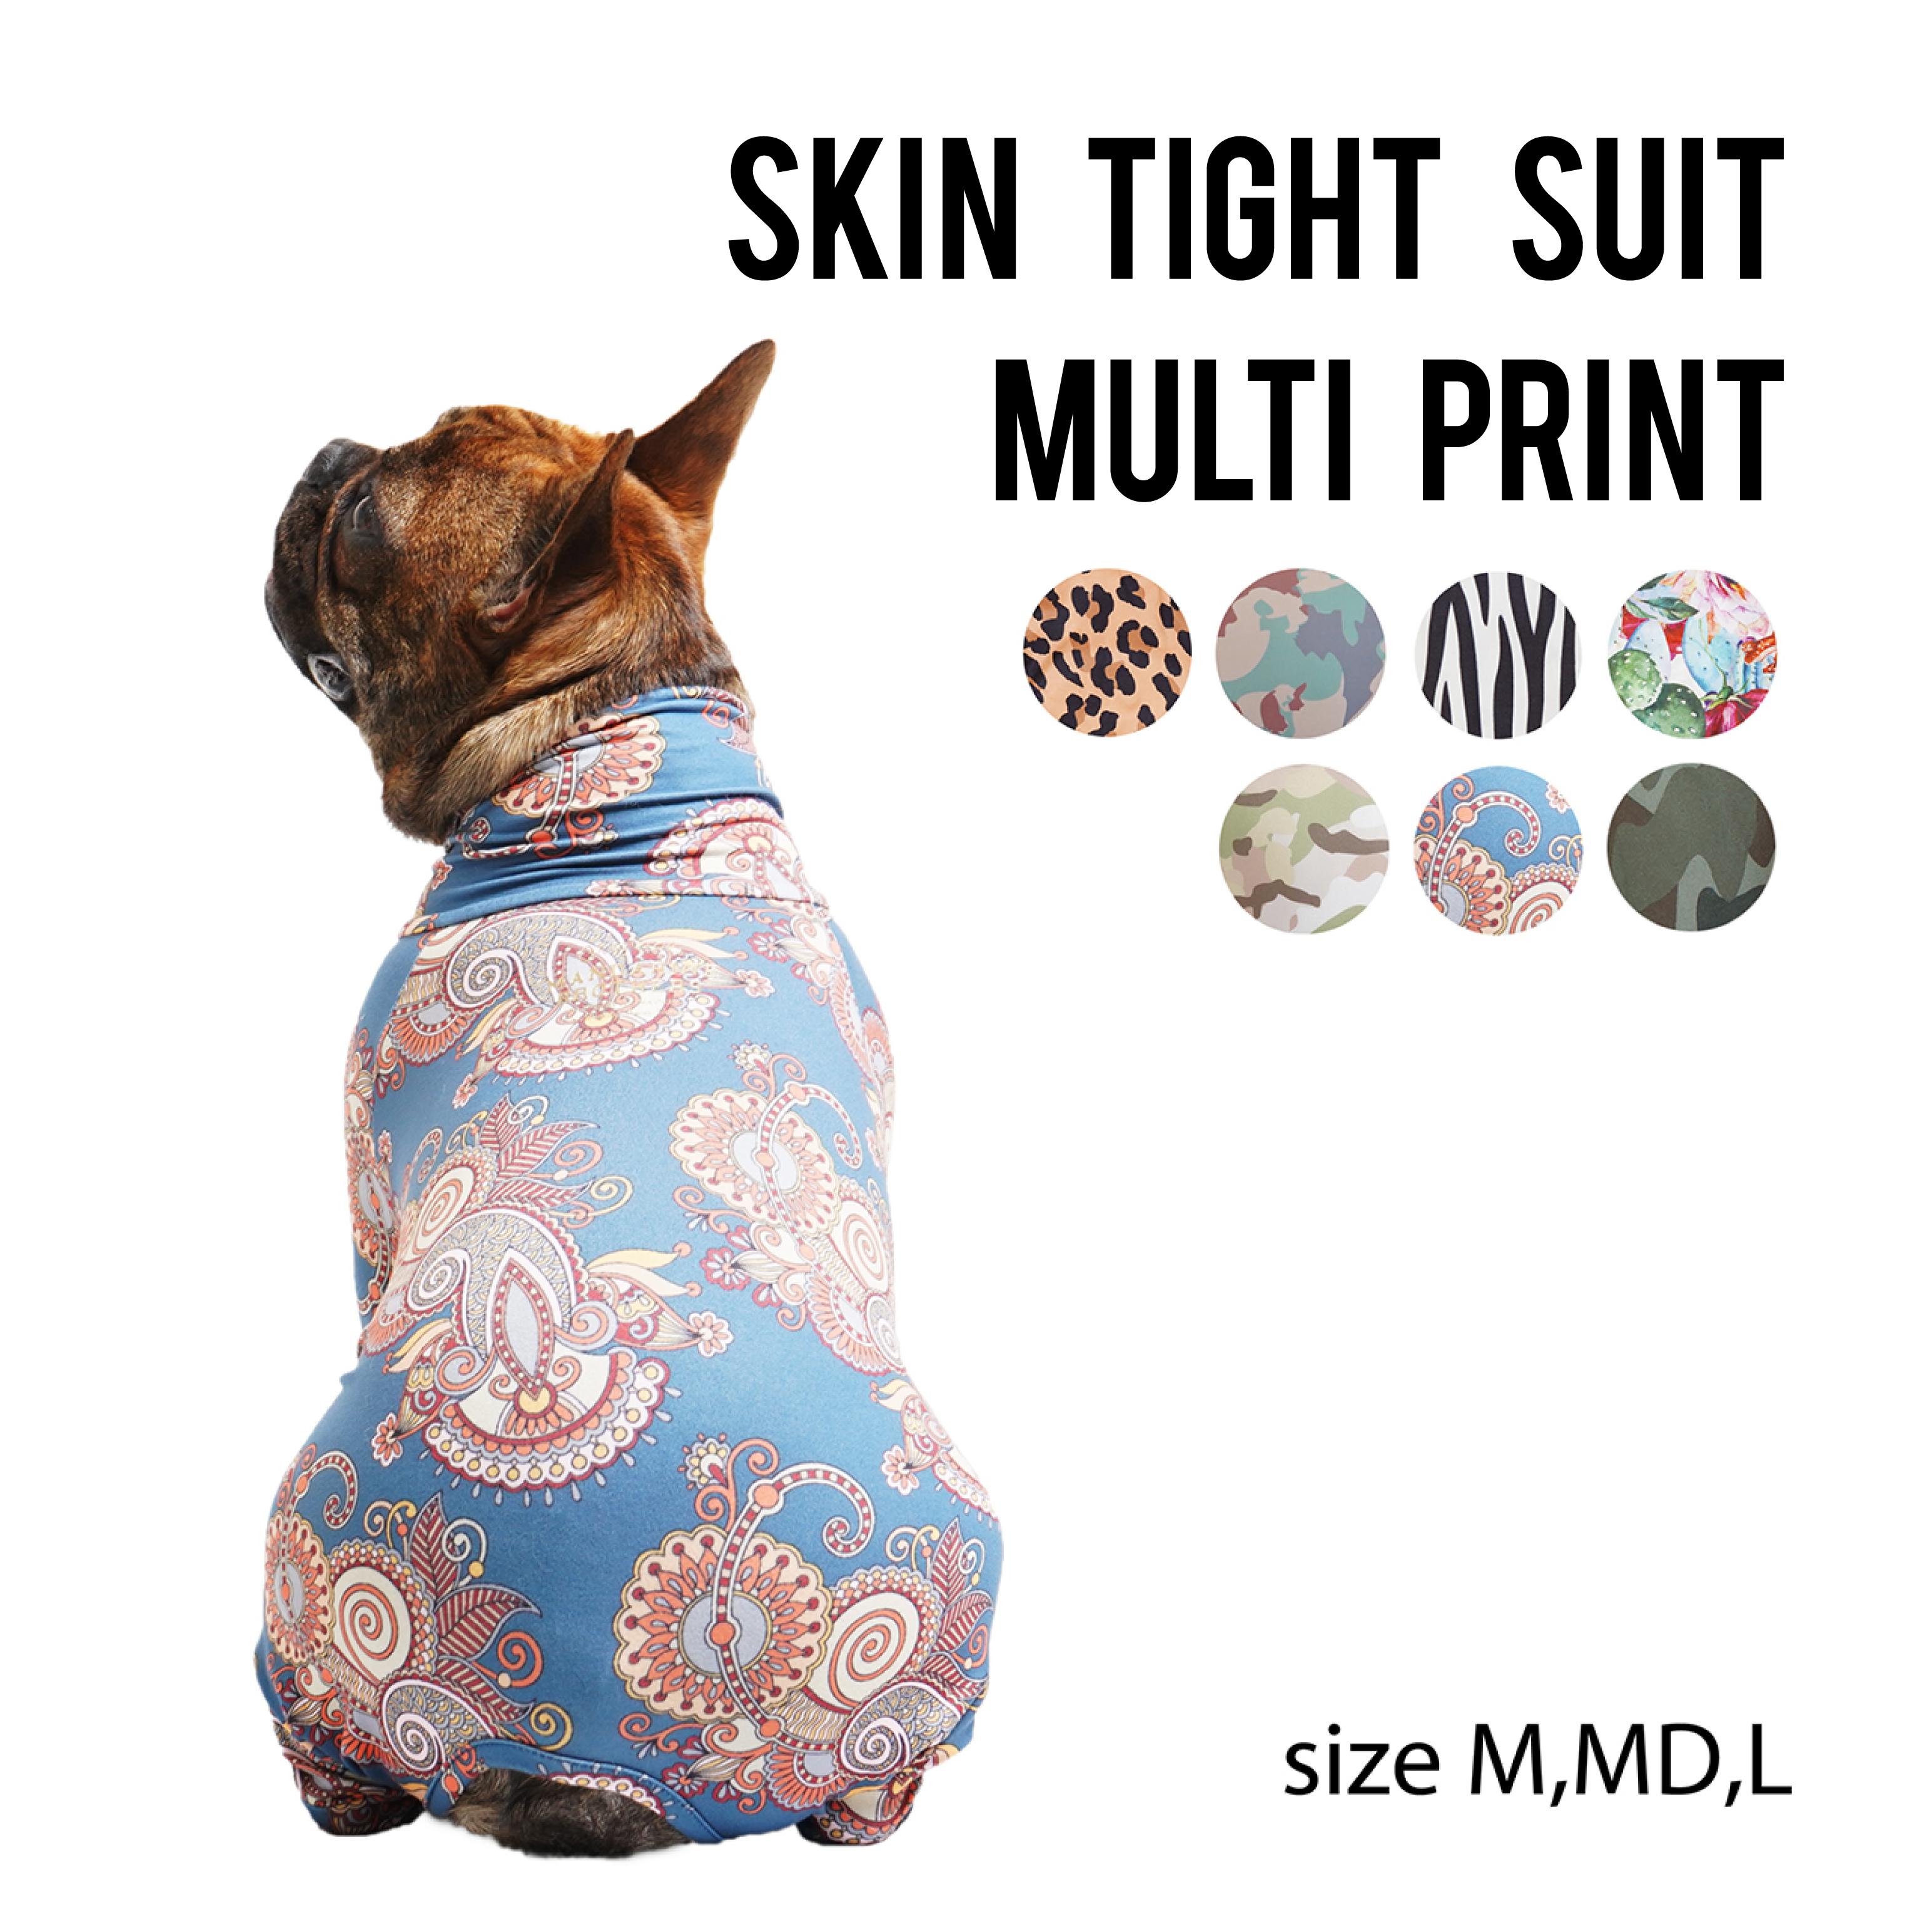 SKIN TIGHT SUIT MULTI PRINT(M,MD,L) スキンタイトスーツマルチプリント